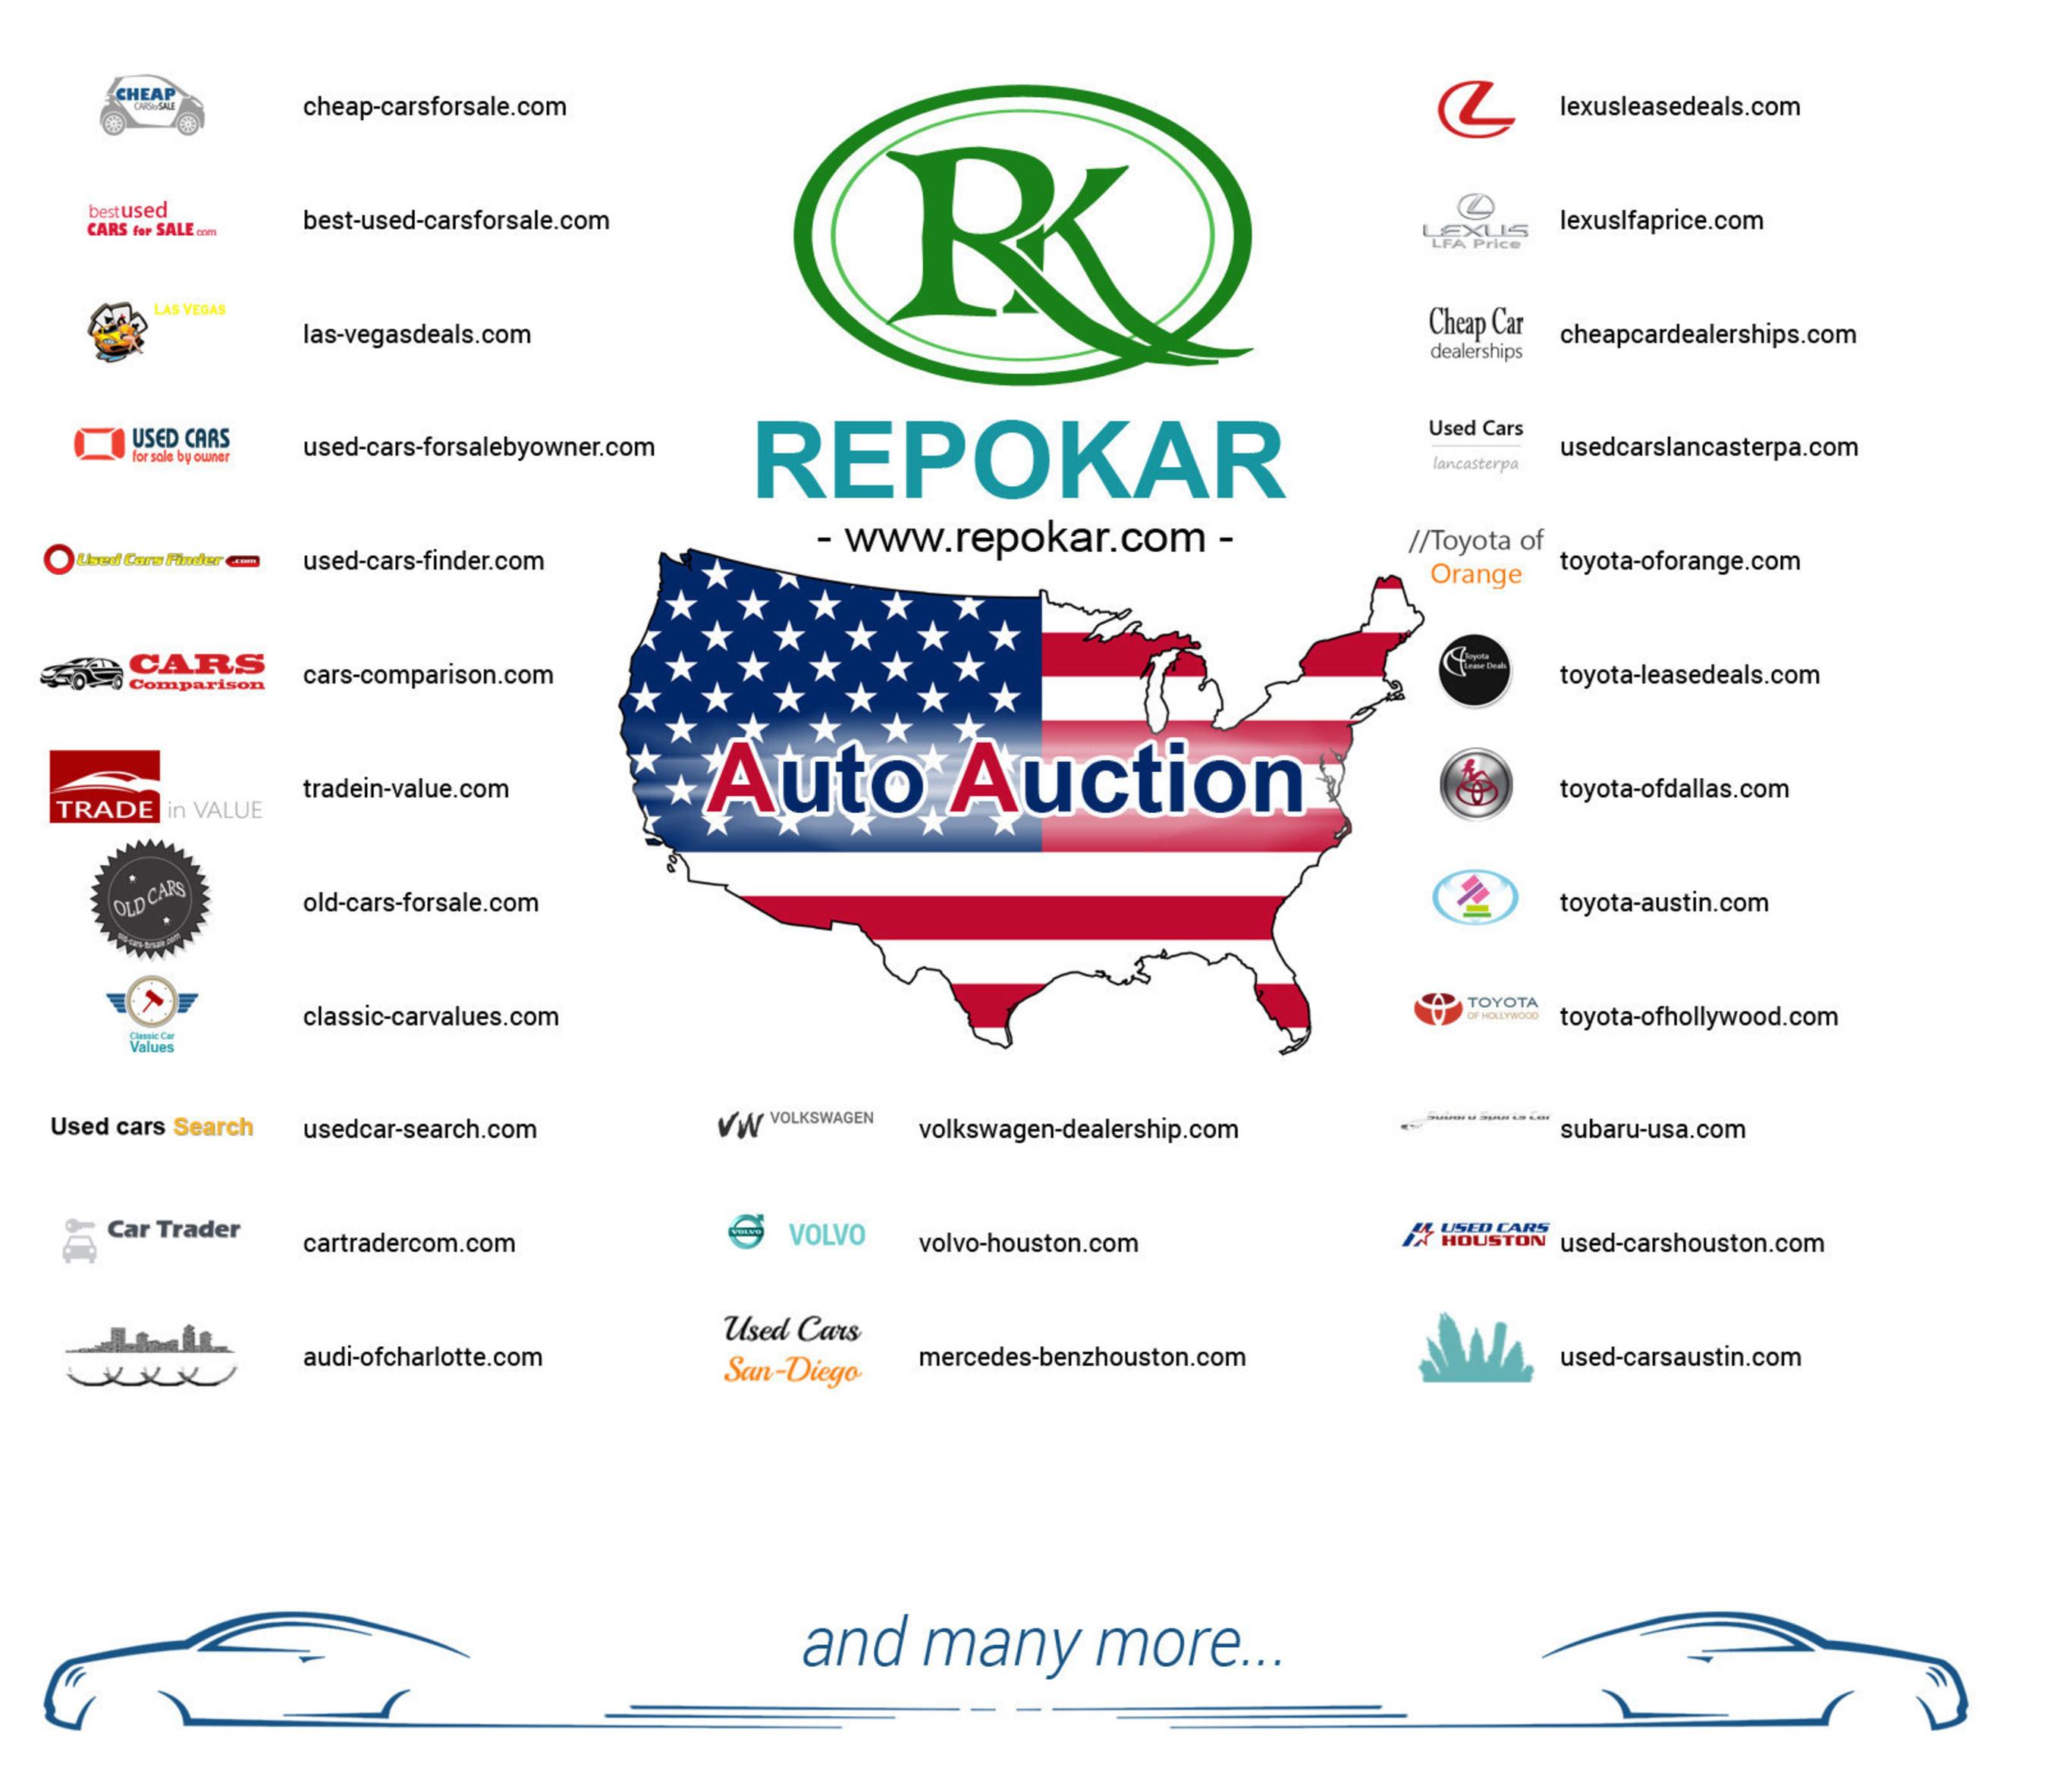 Renowned Used Car Auction Company Repokar Announces Partnership ...